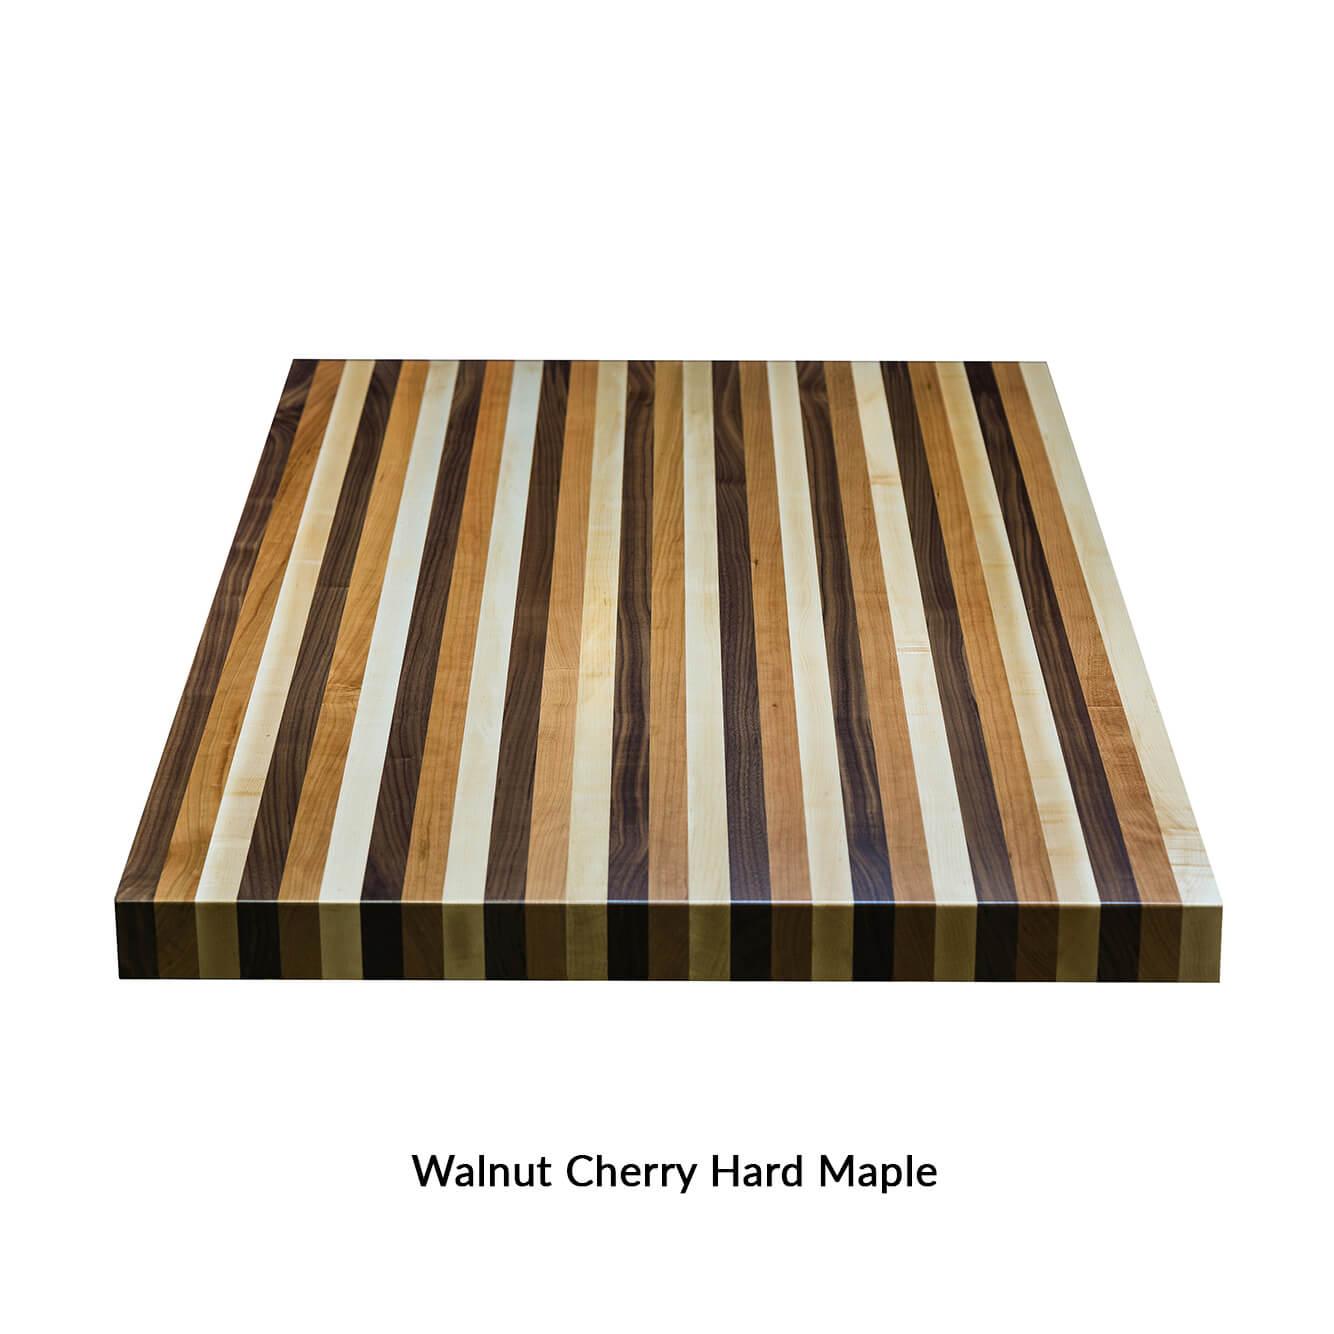 6-walnut-cherry-hard-maple-option.jpg